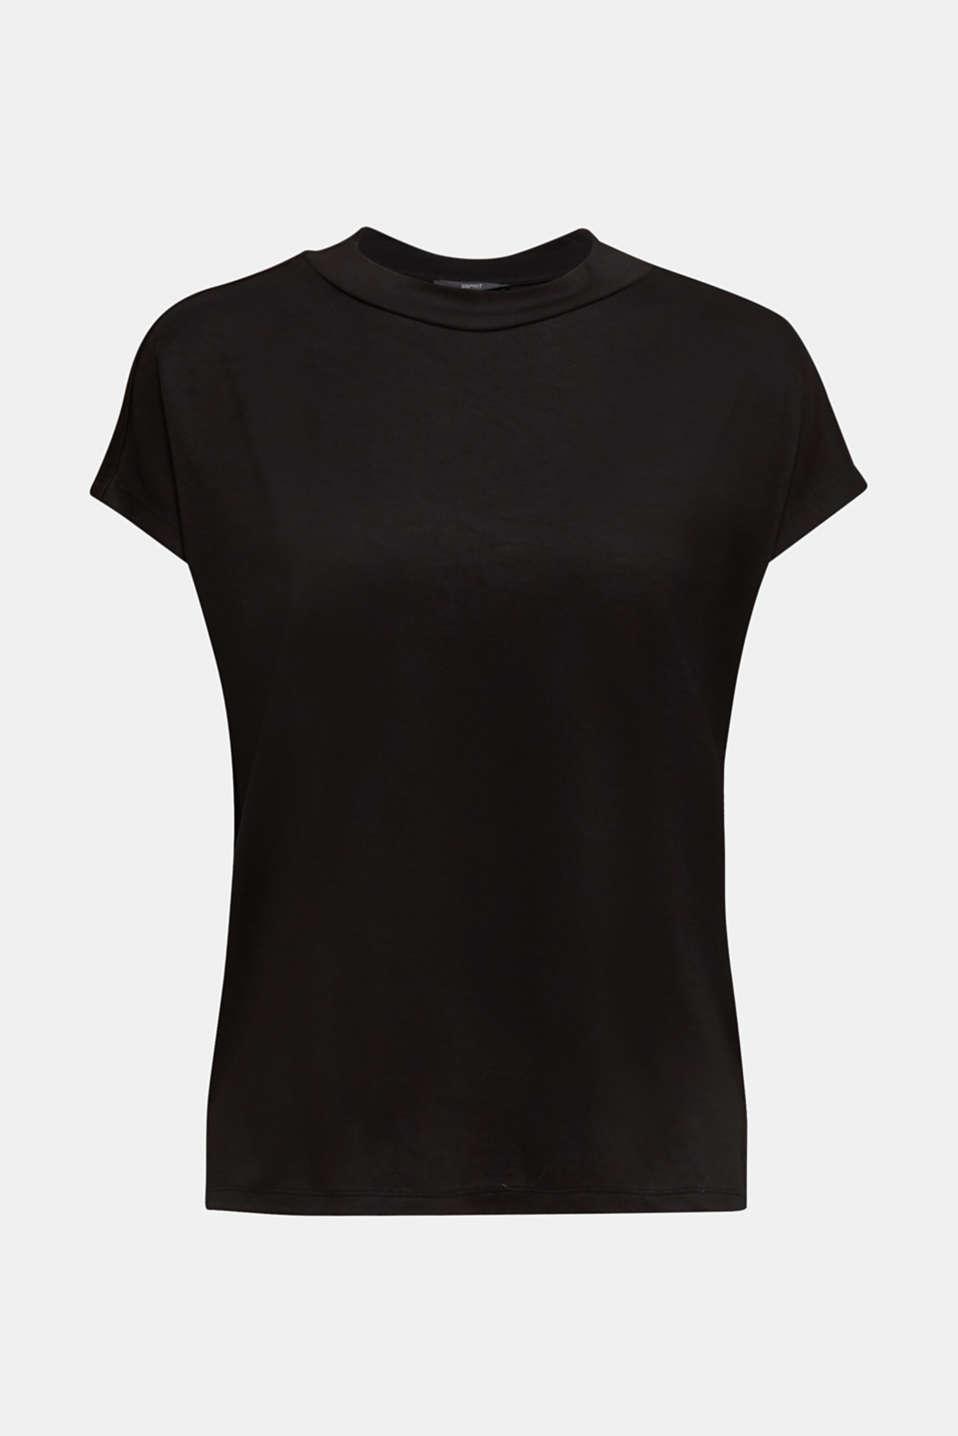 Piqué top with a wide neckline trim, BLACK, detail image number 7